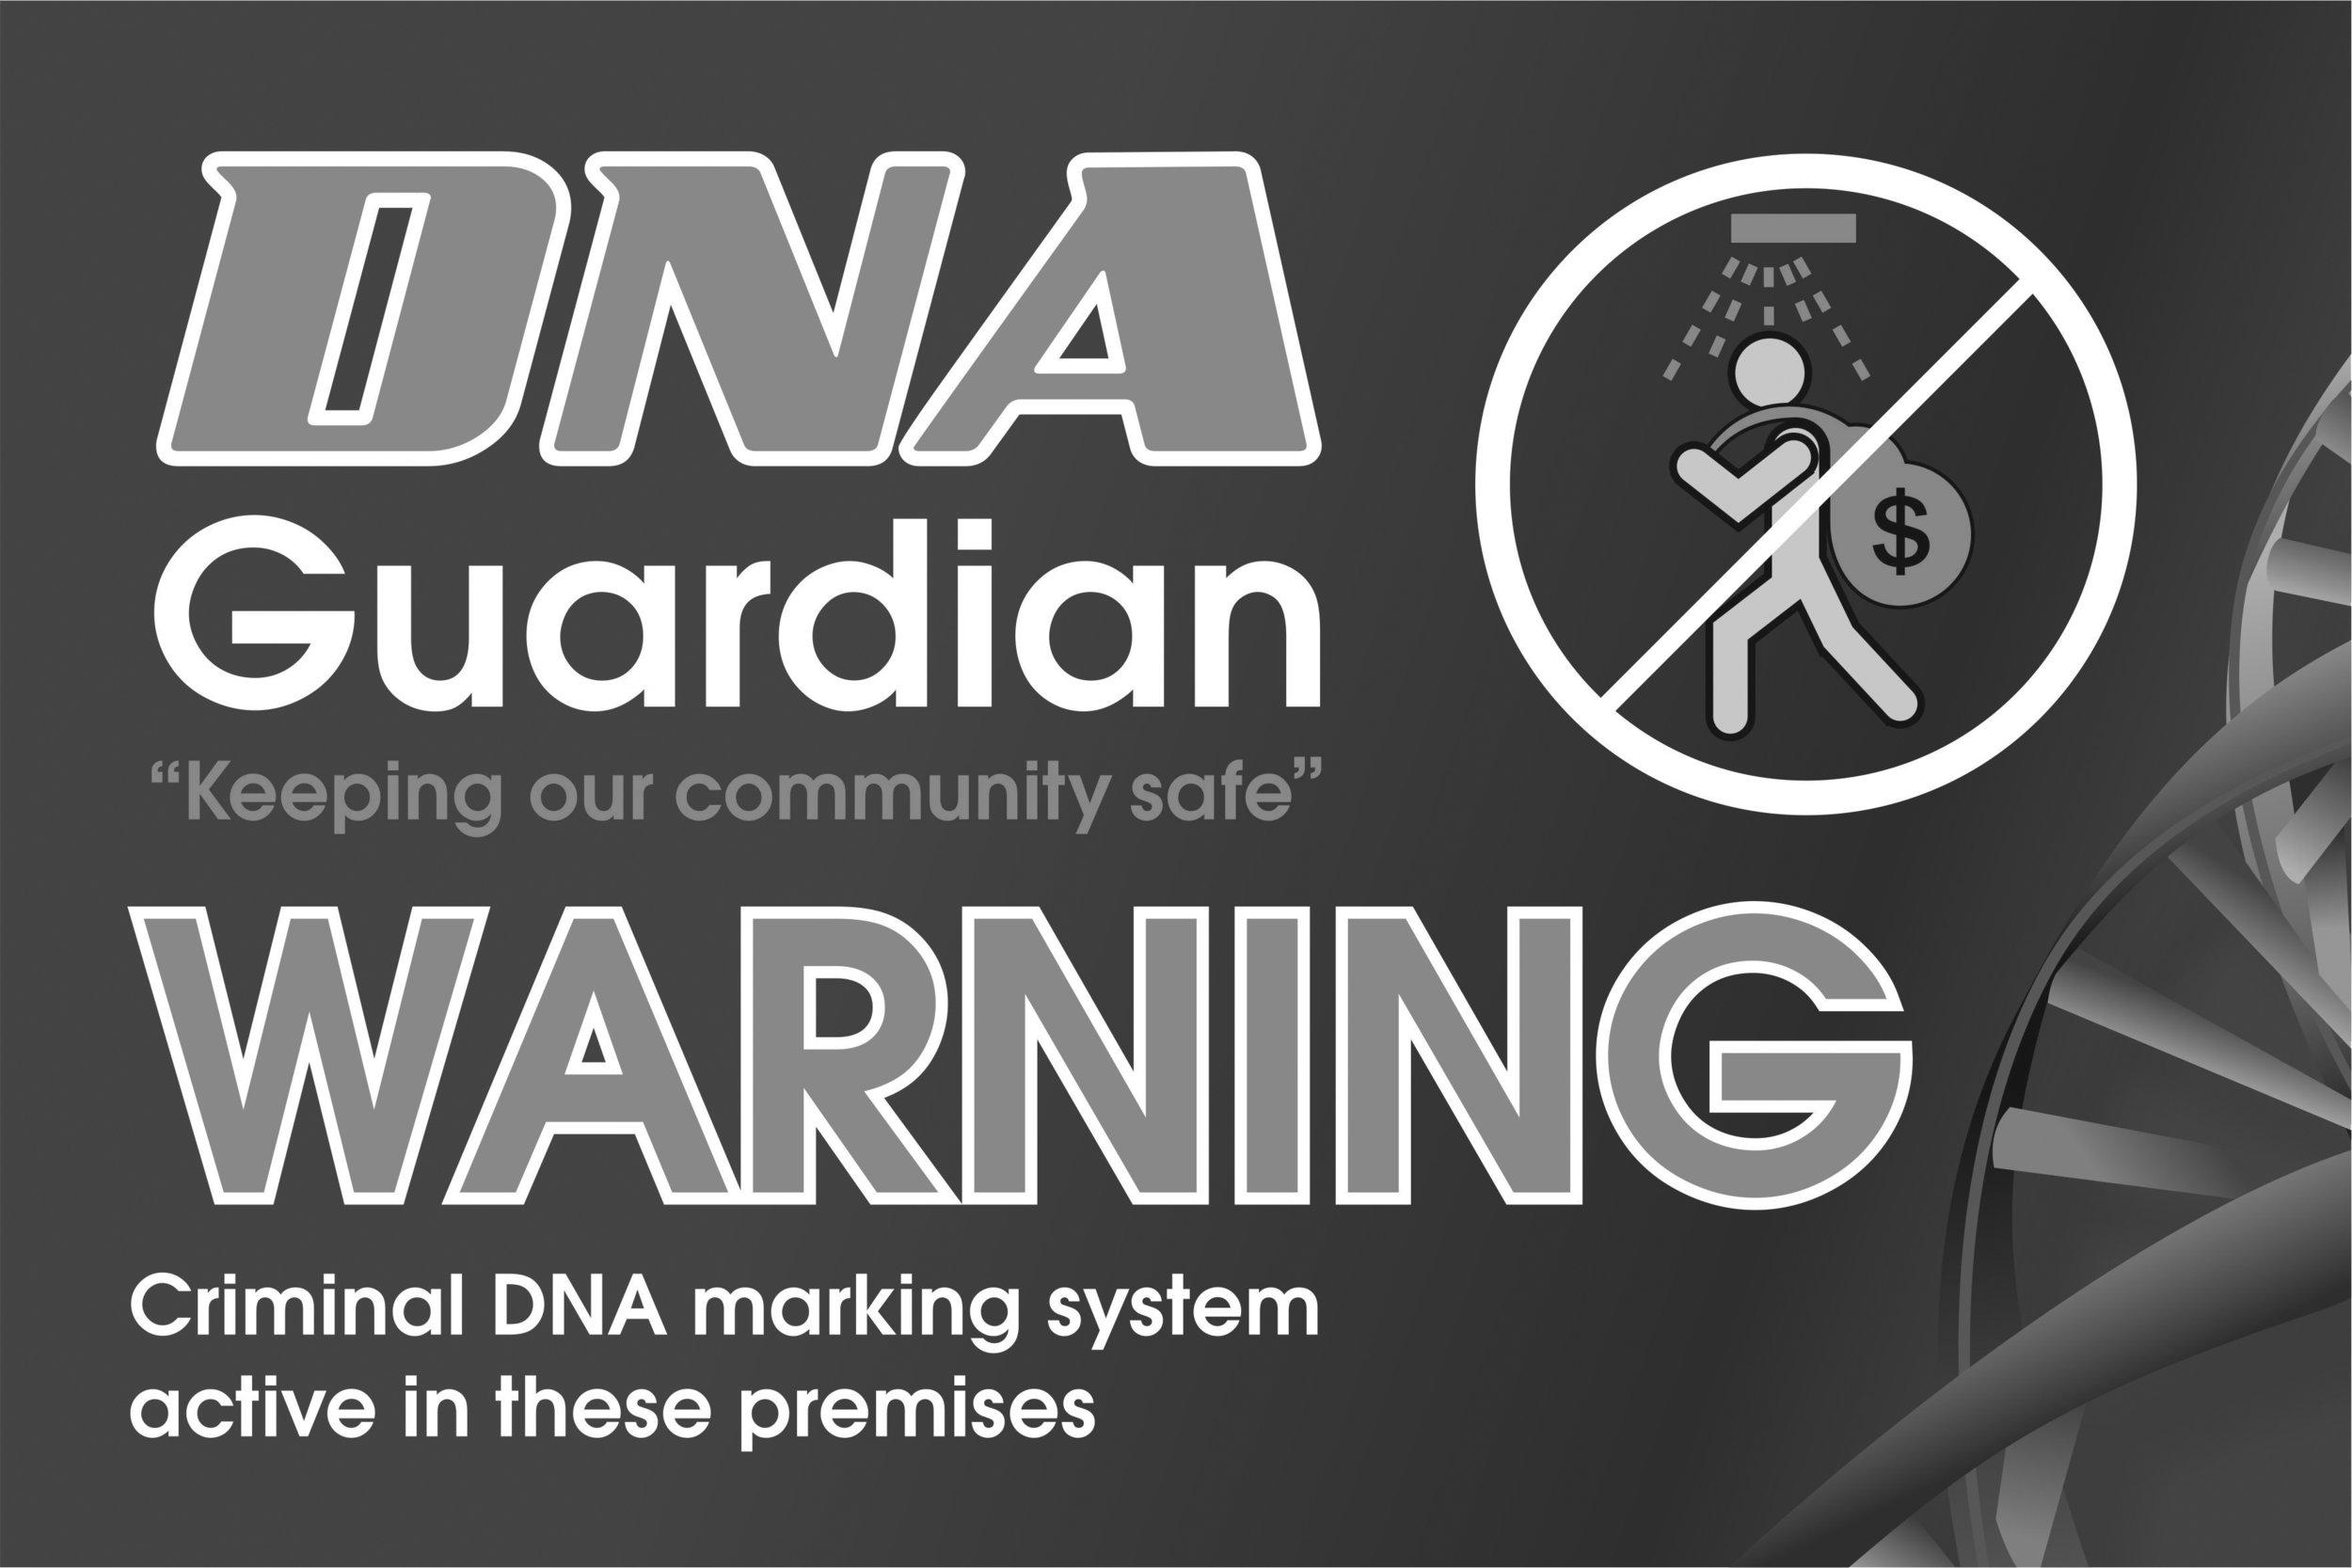 DNA Guardian warning 300x200 decal - BW.jpg